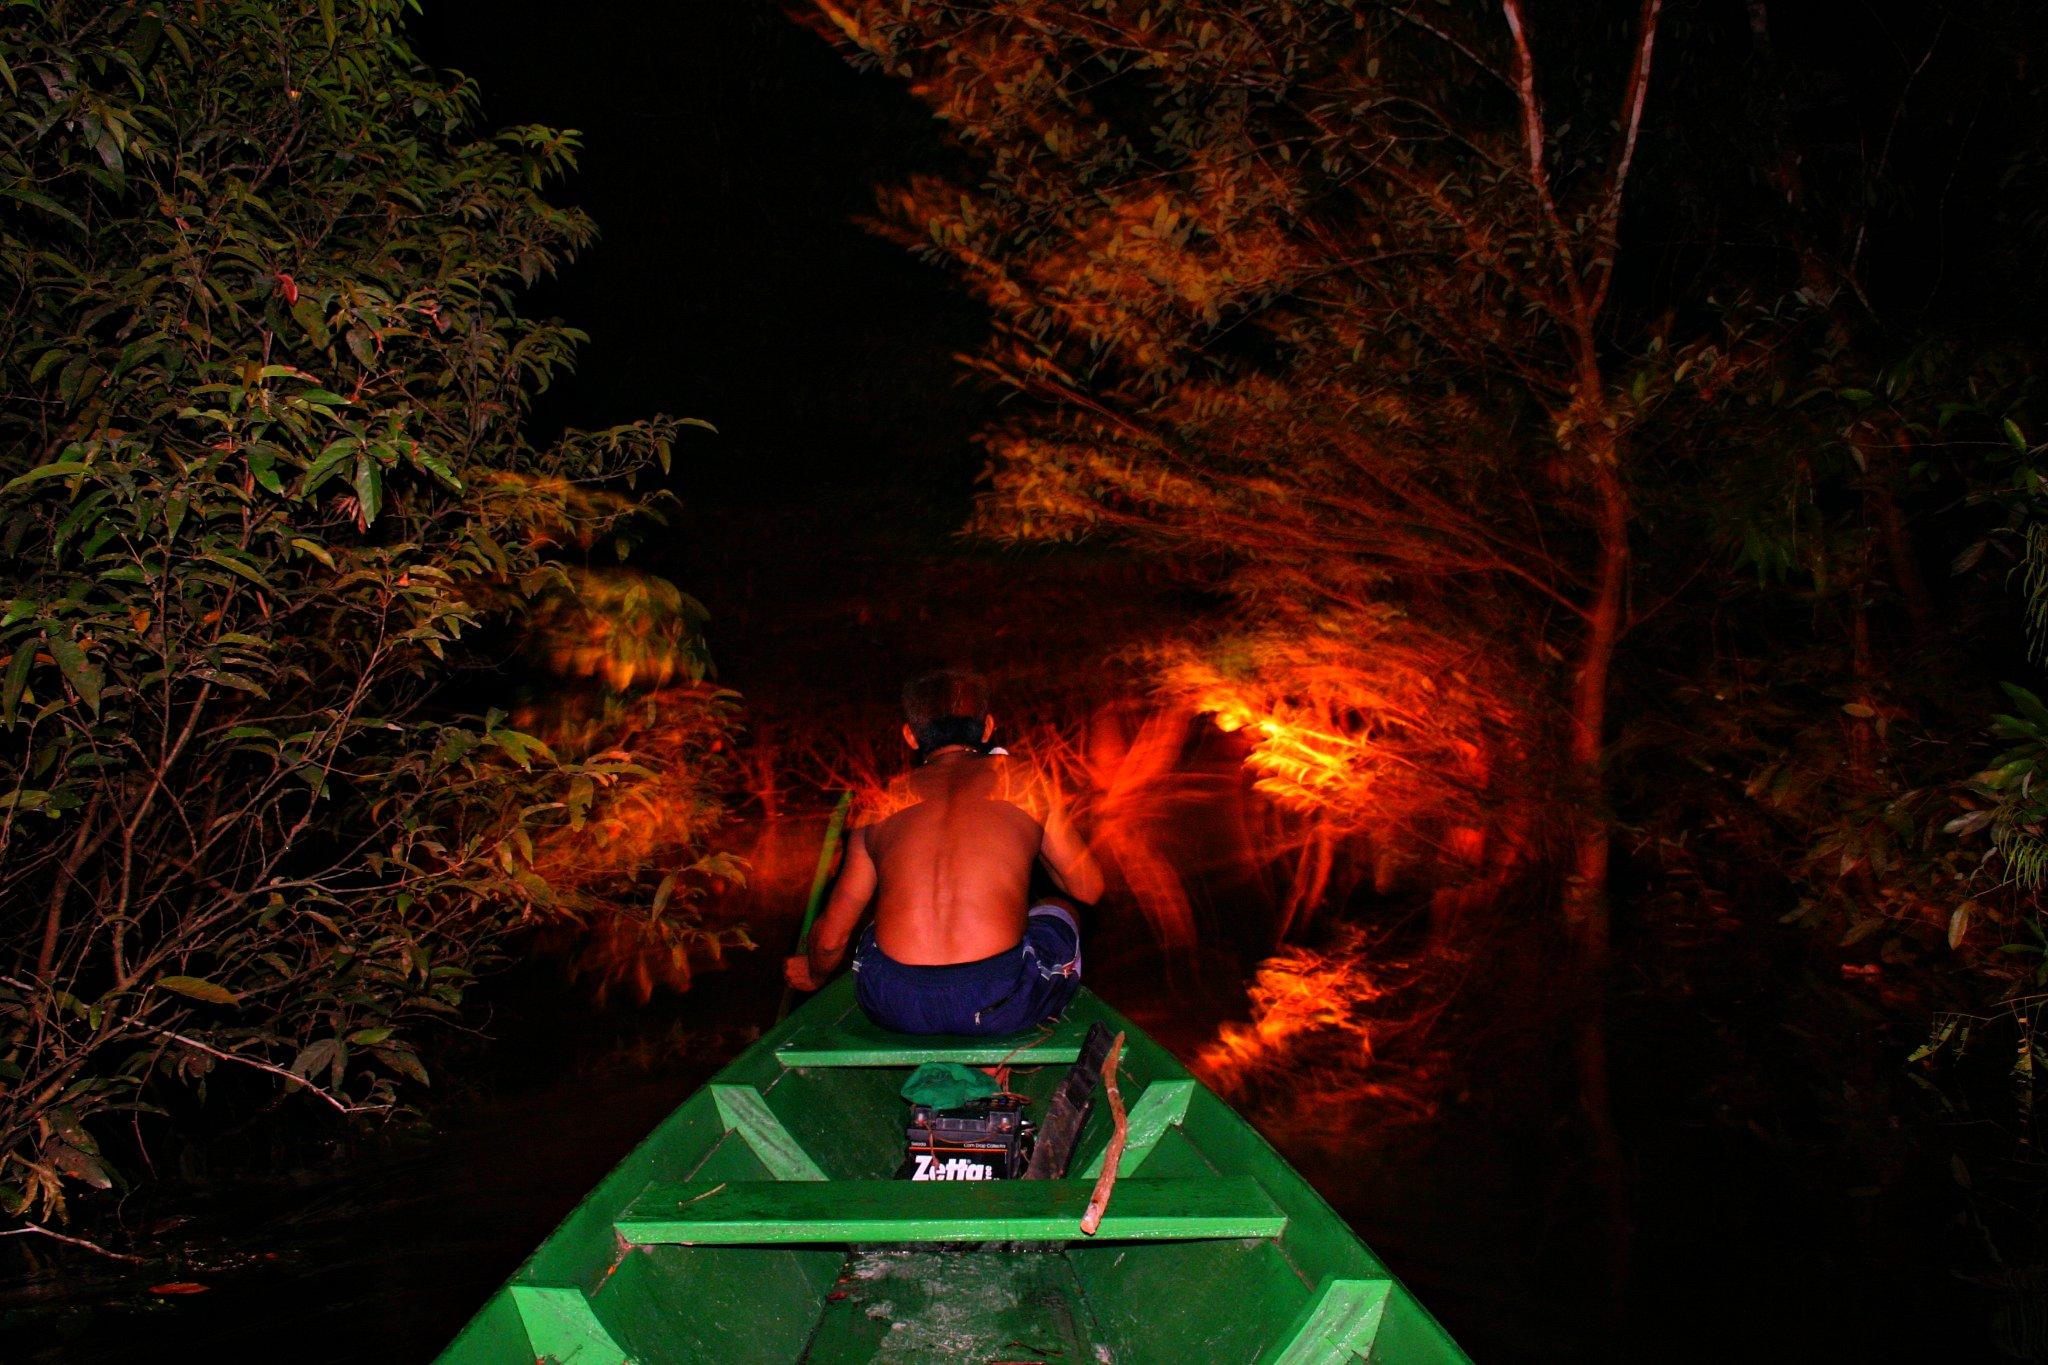 night in jungle